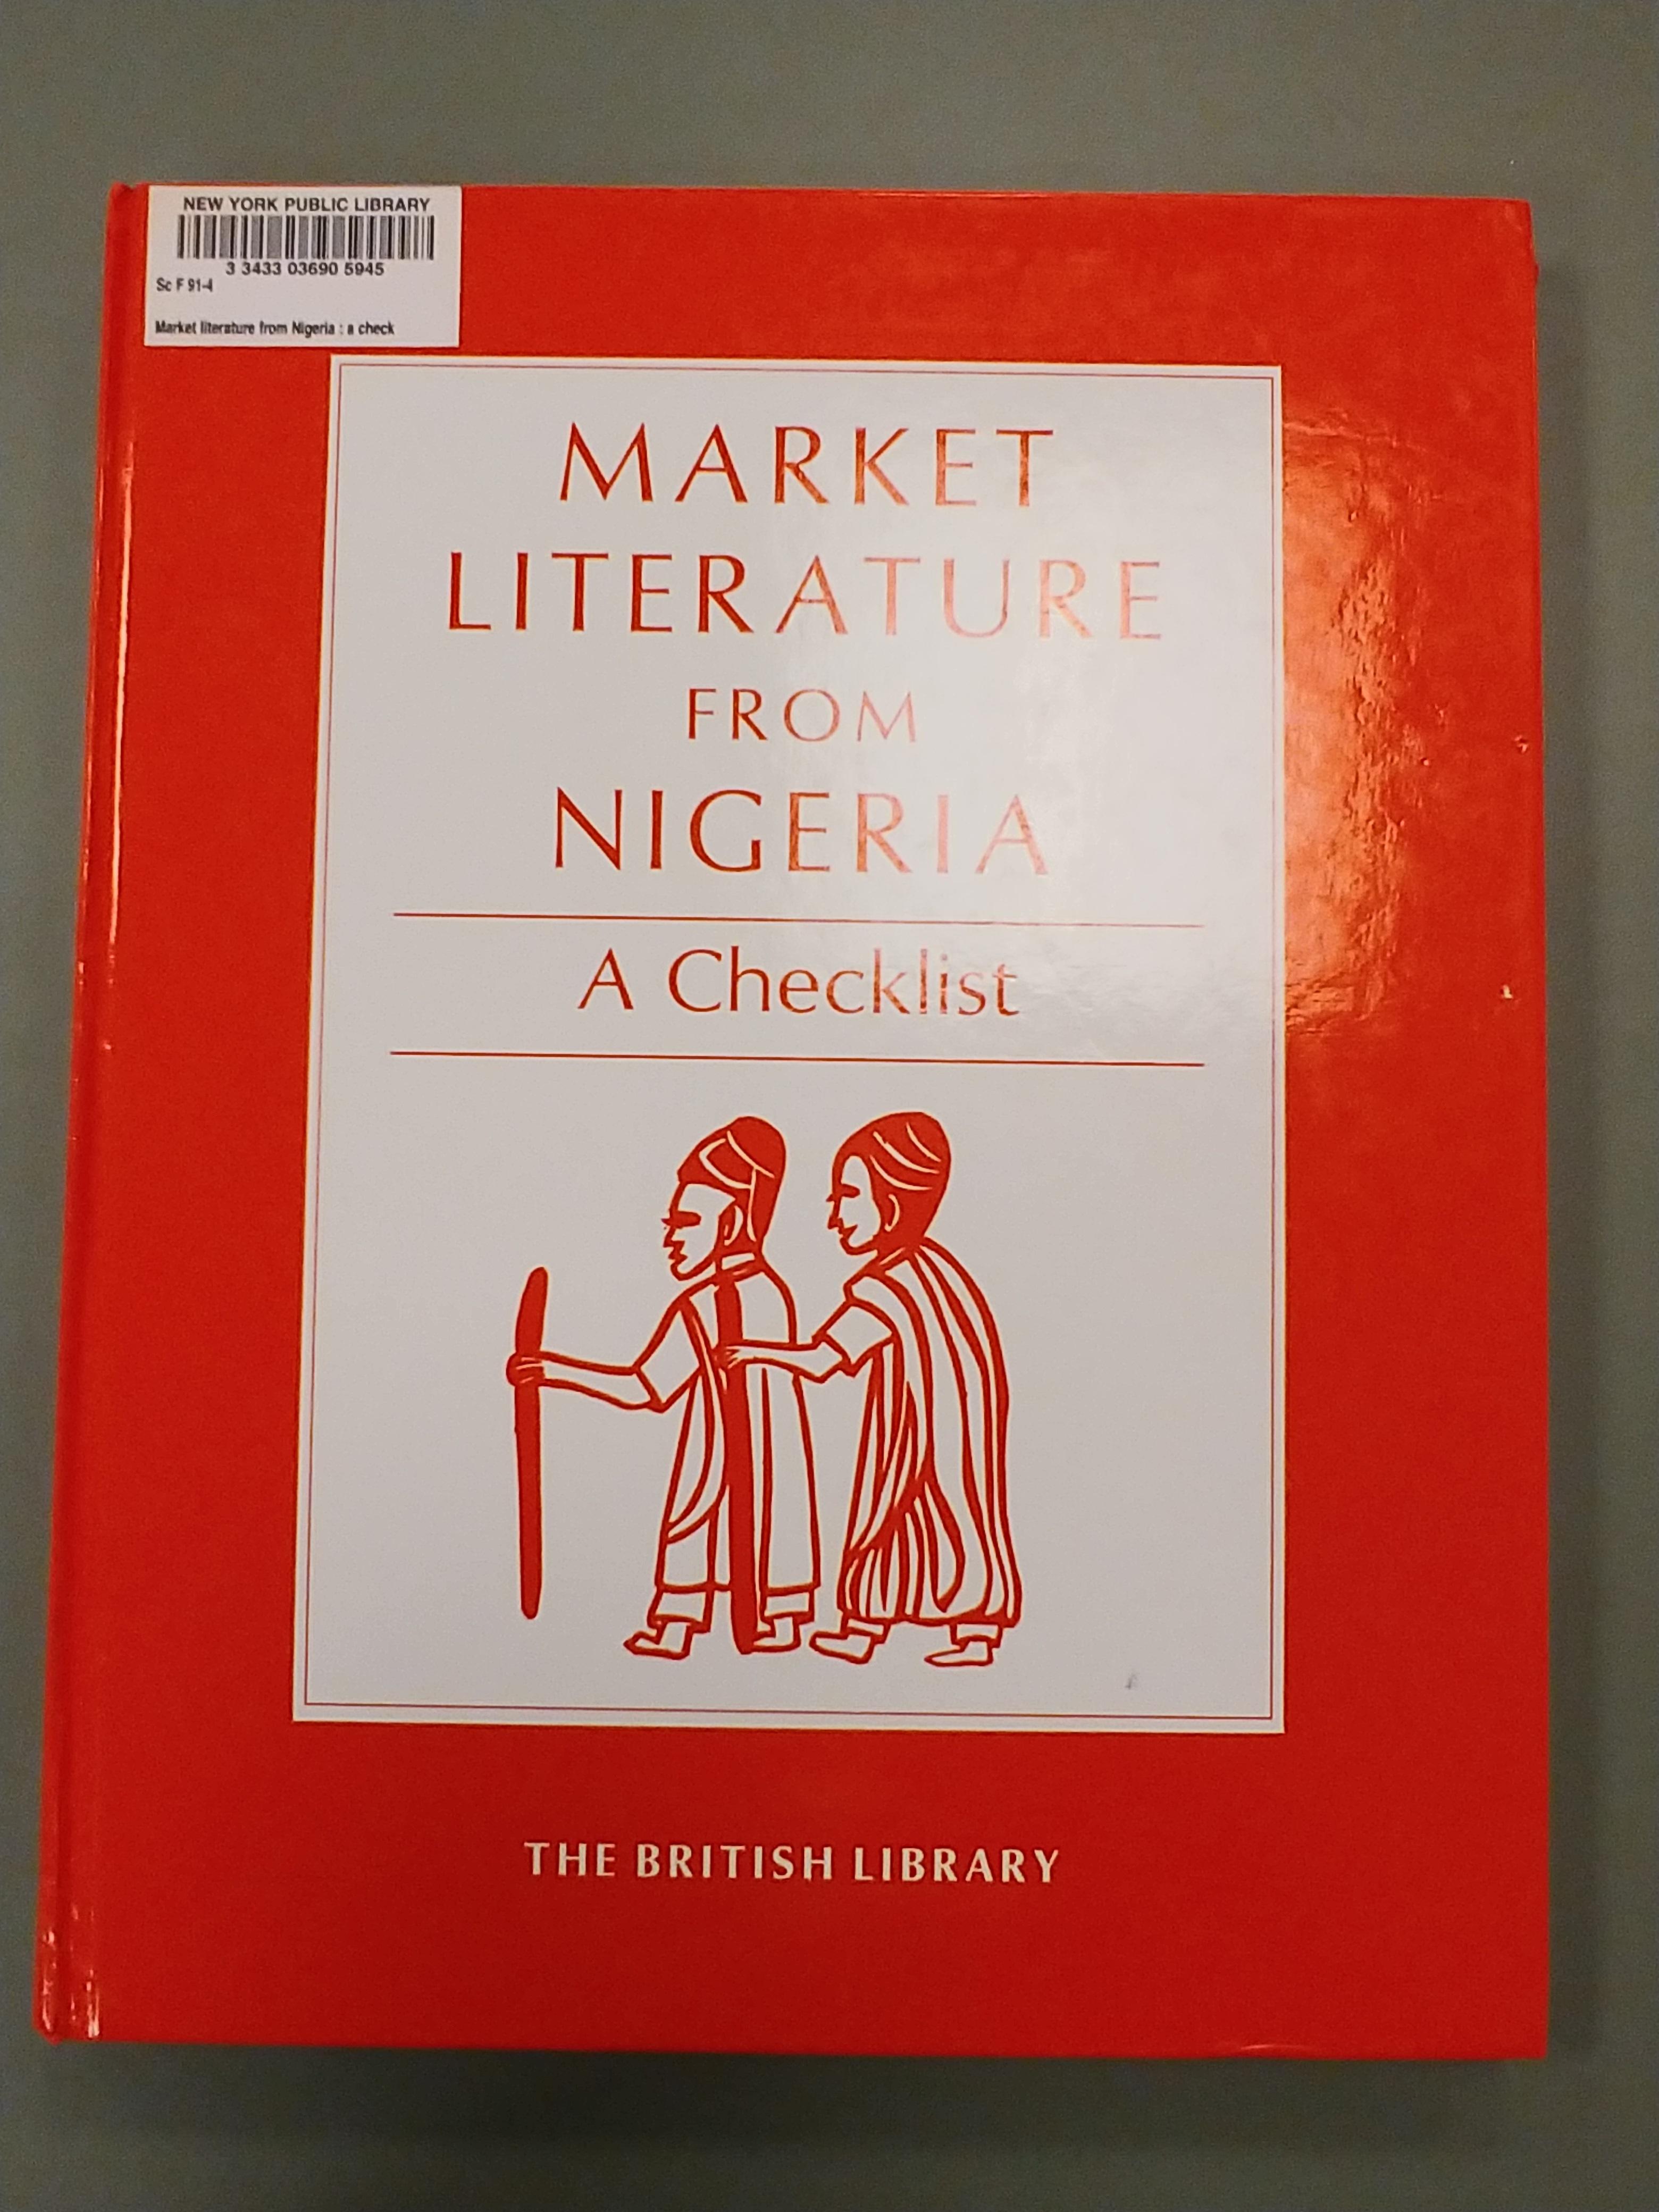 Image of Market Literature From Nigeria: A Checklist